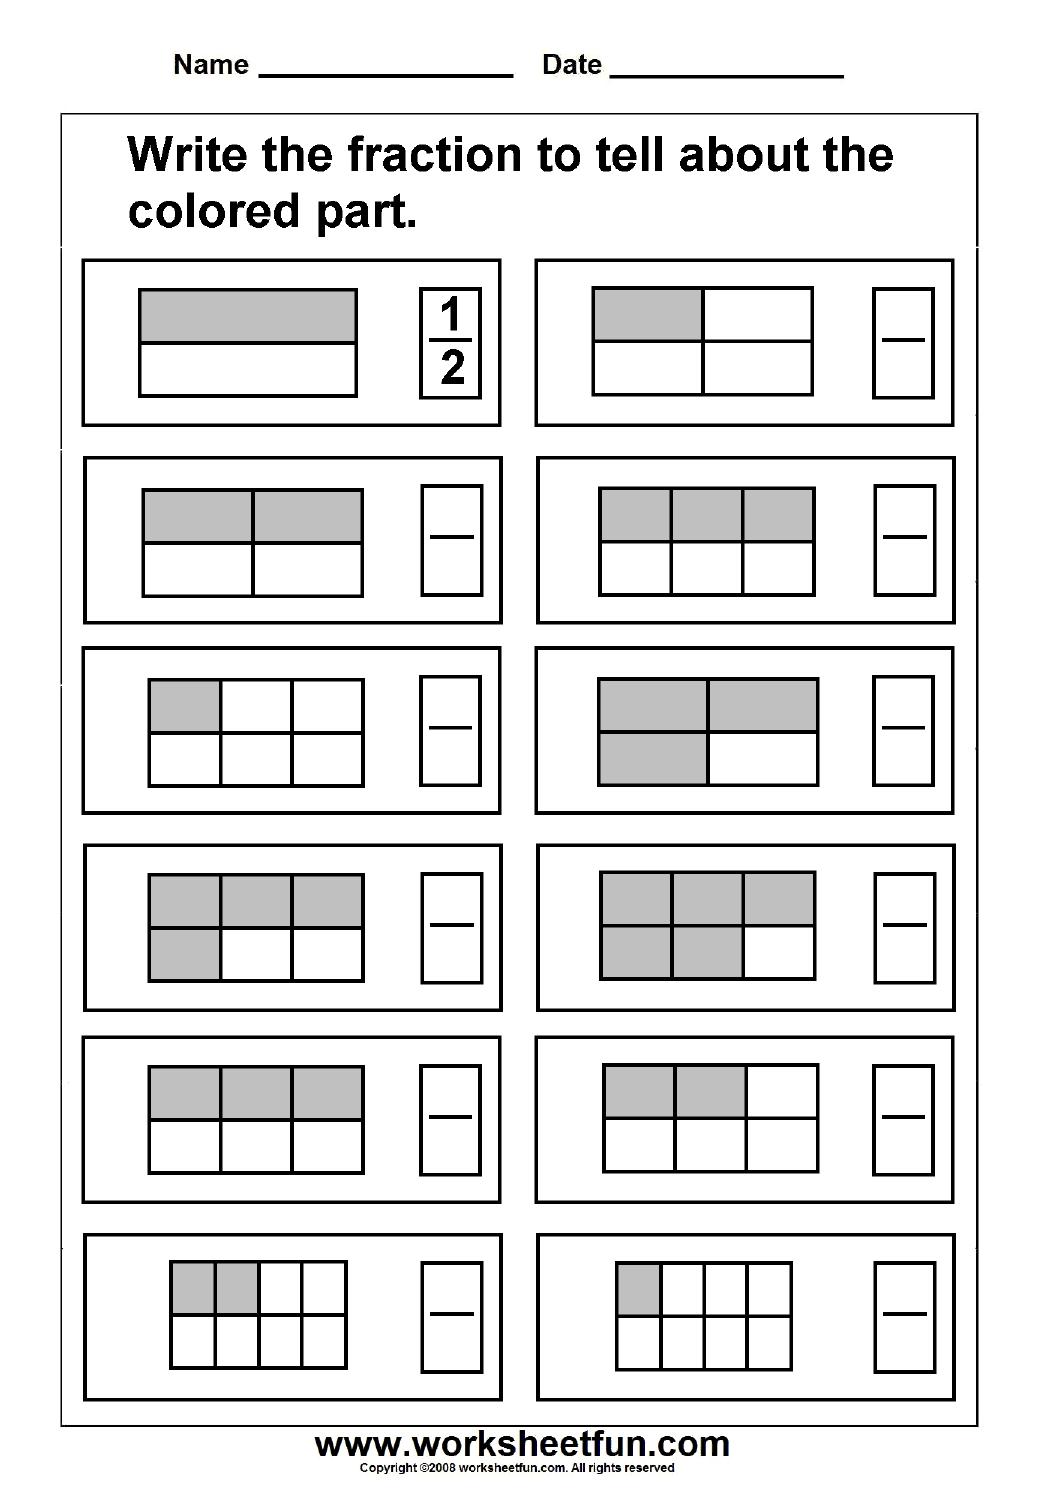 Math worksheets for all levels | 2nd grade school work | Pinterest ...